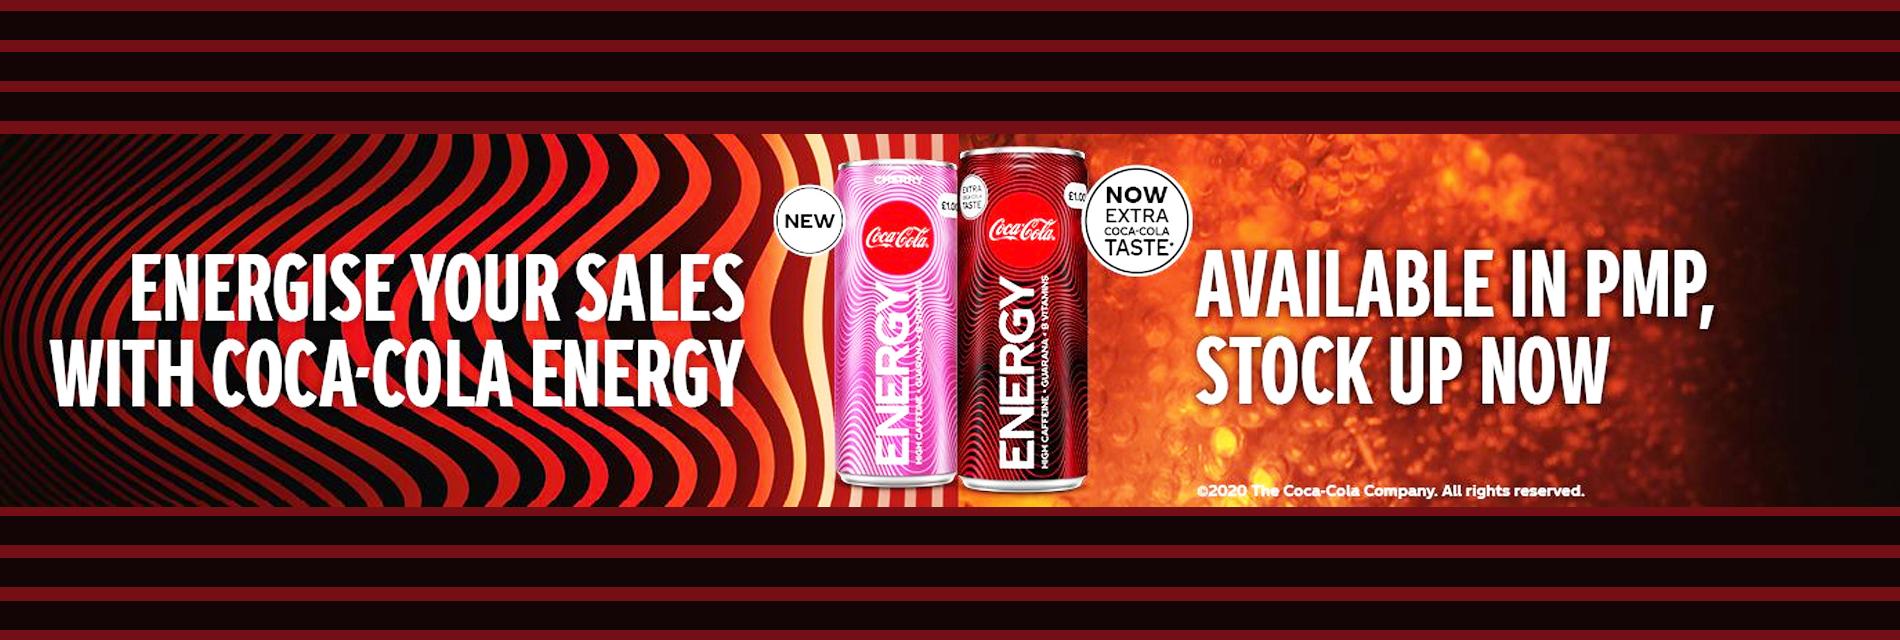 http://www.enaturalltd.com/product-category/drinks/softdrinks/coca-cola/